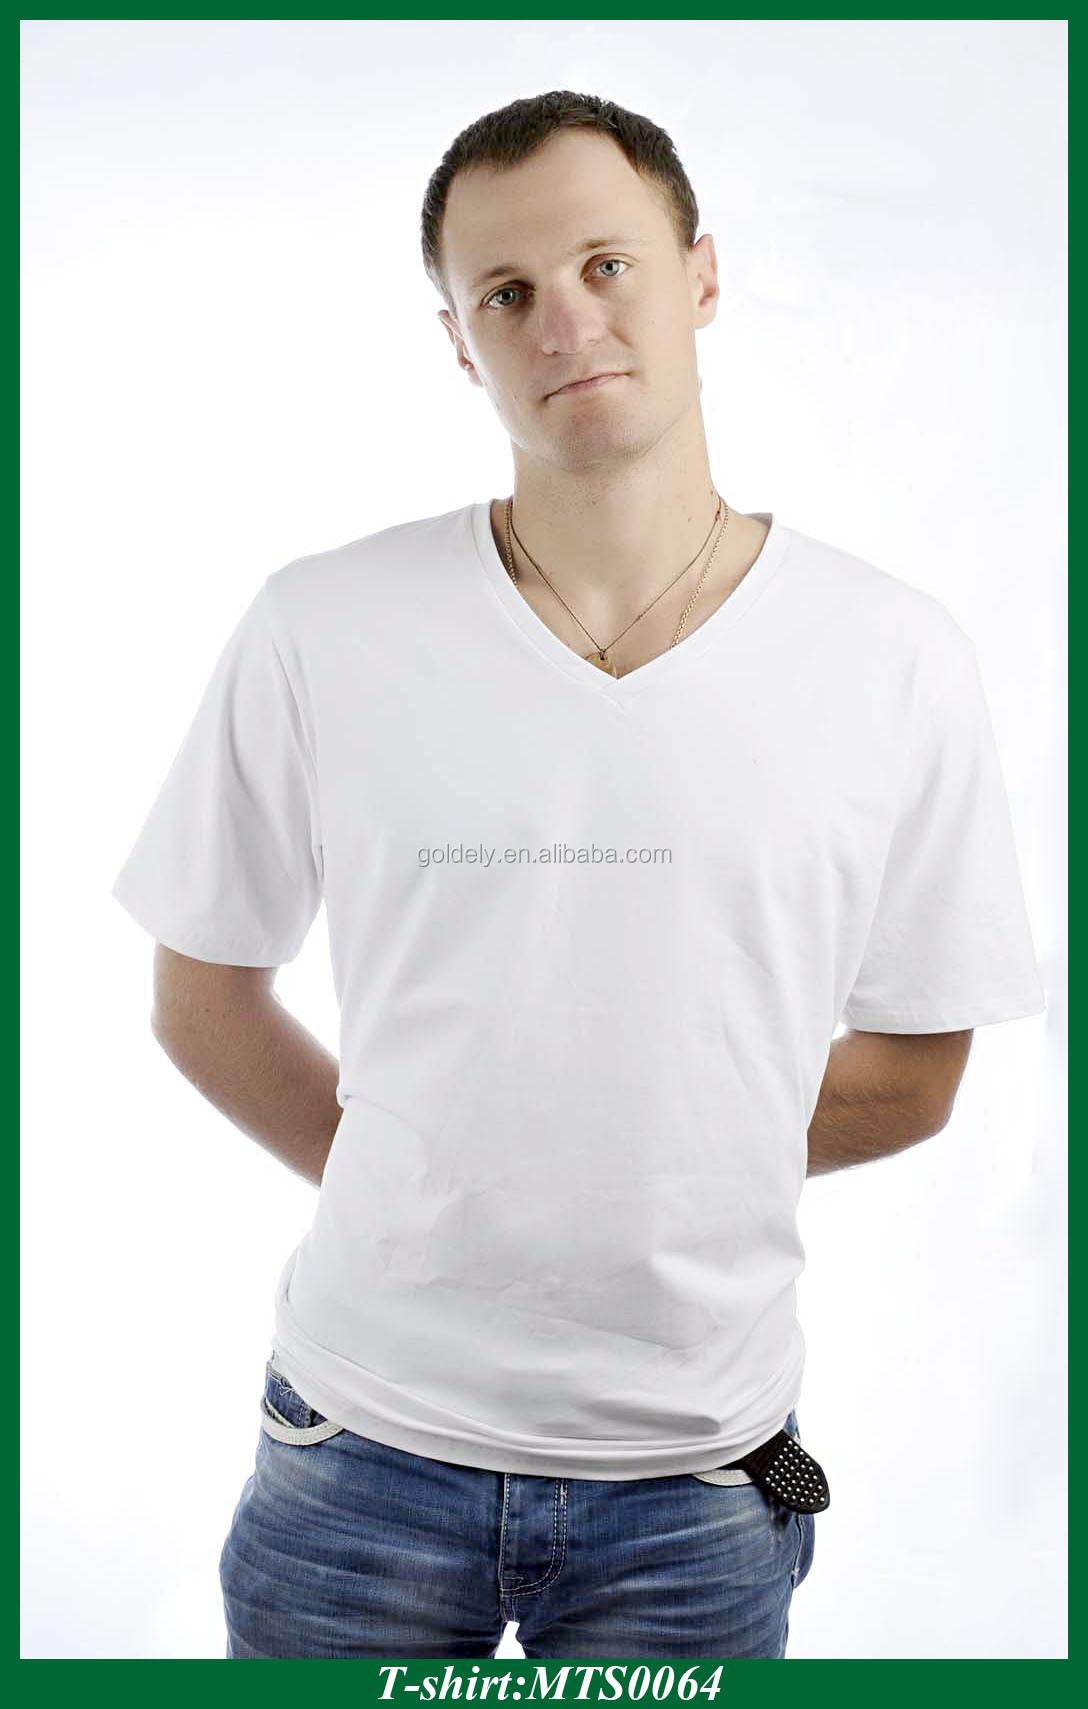 white t shirt23.jpg